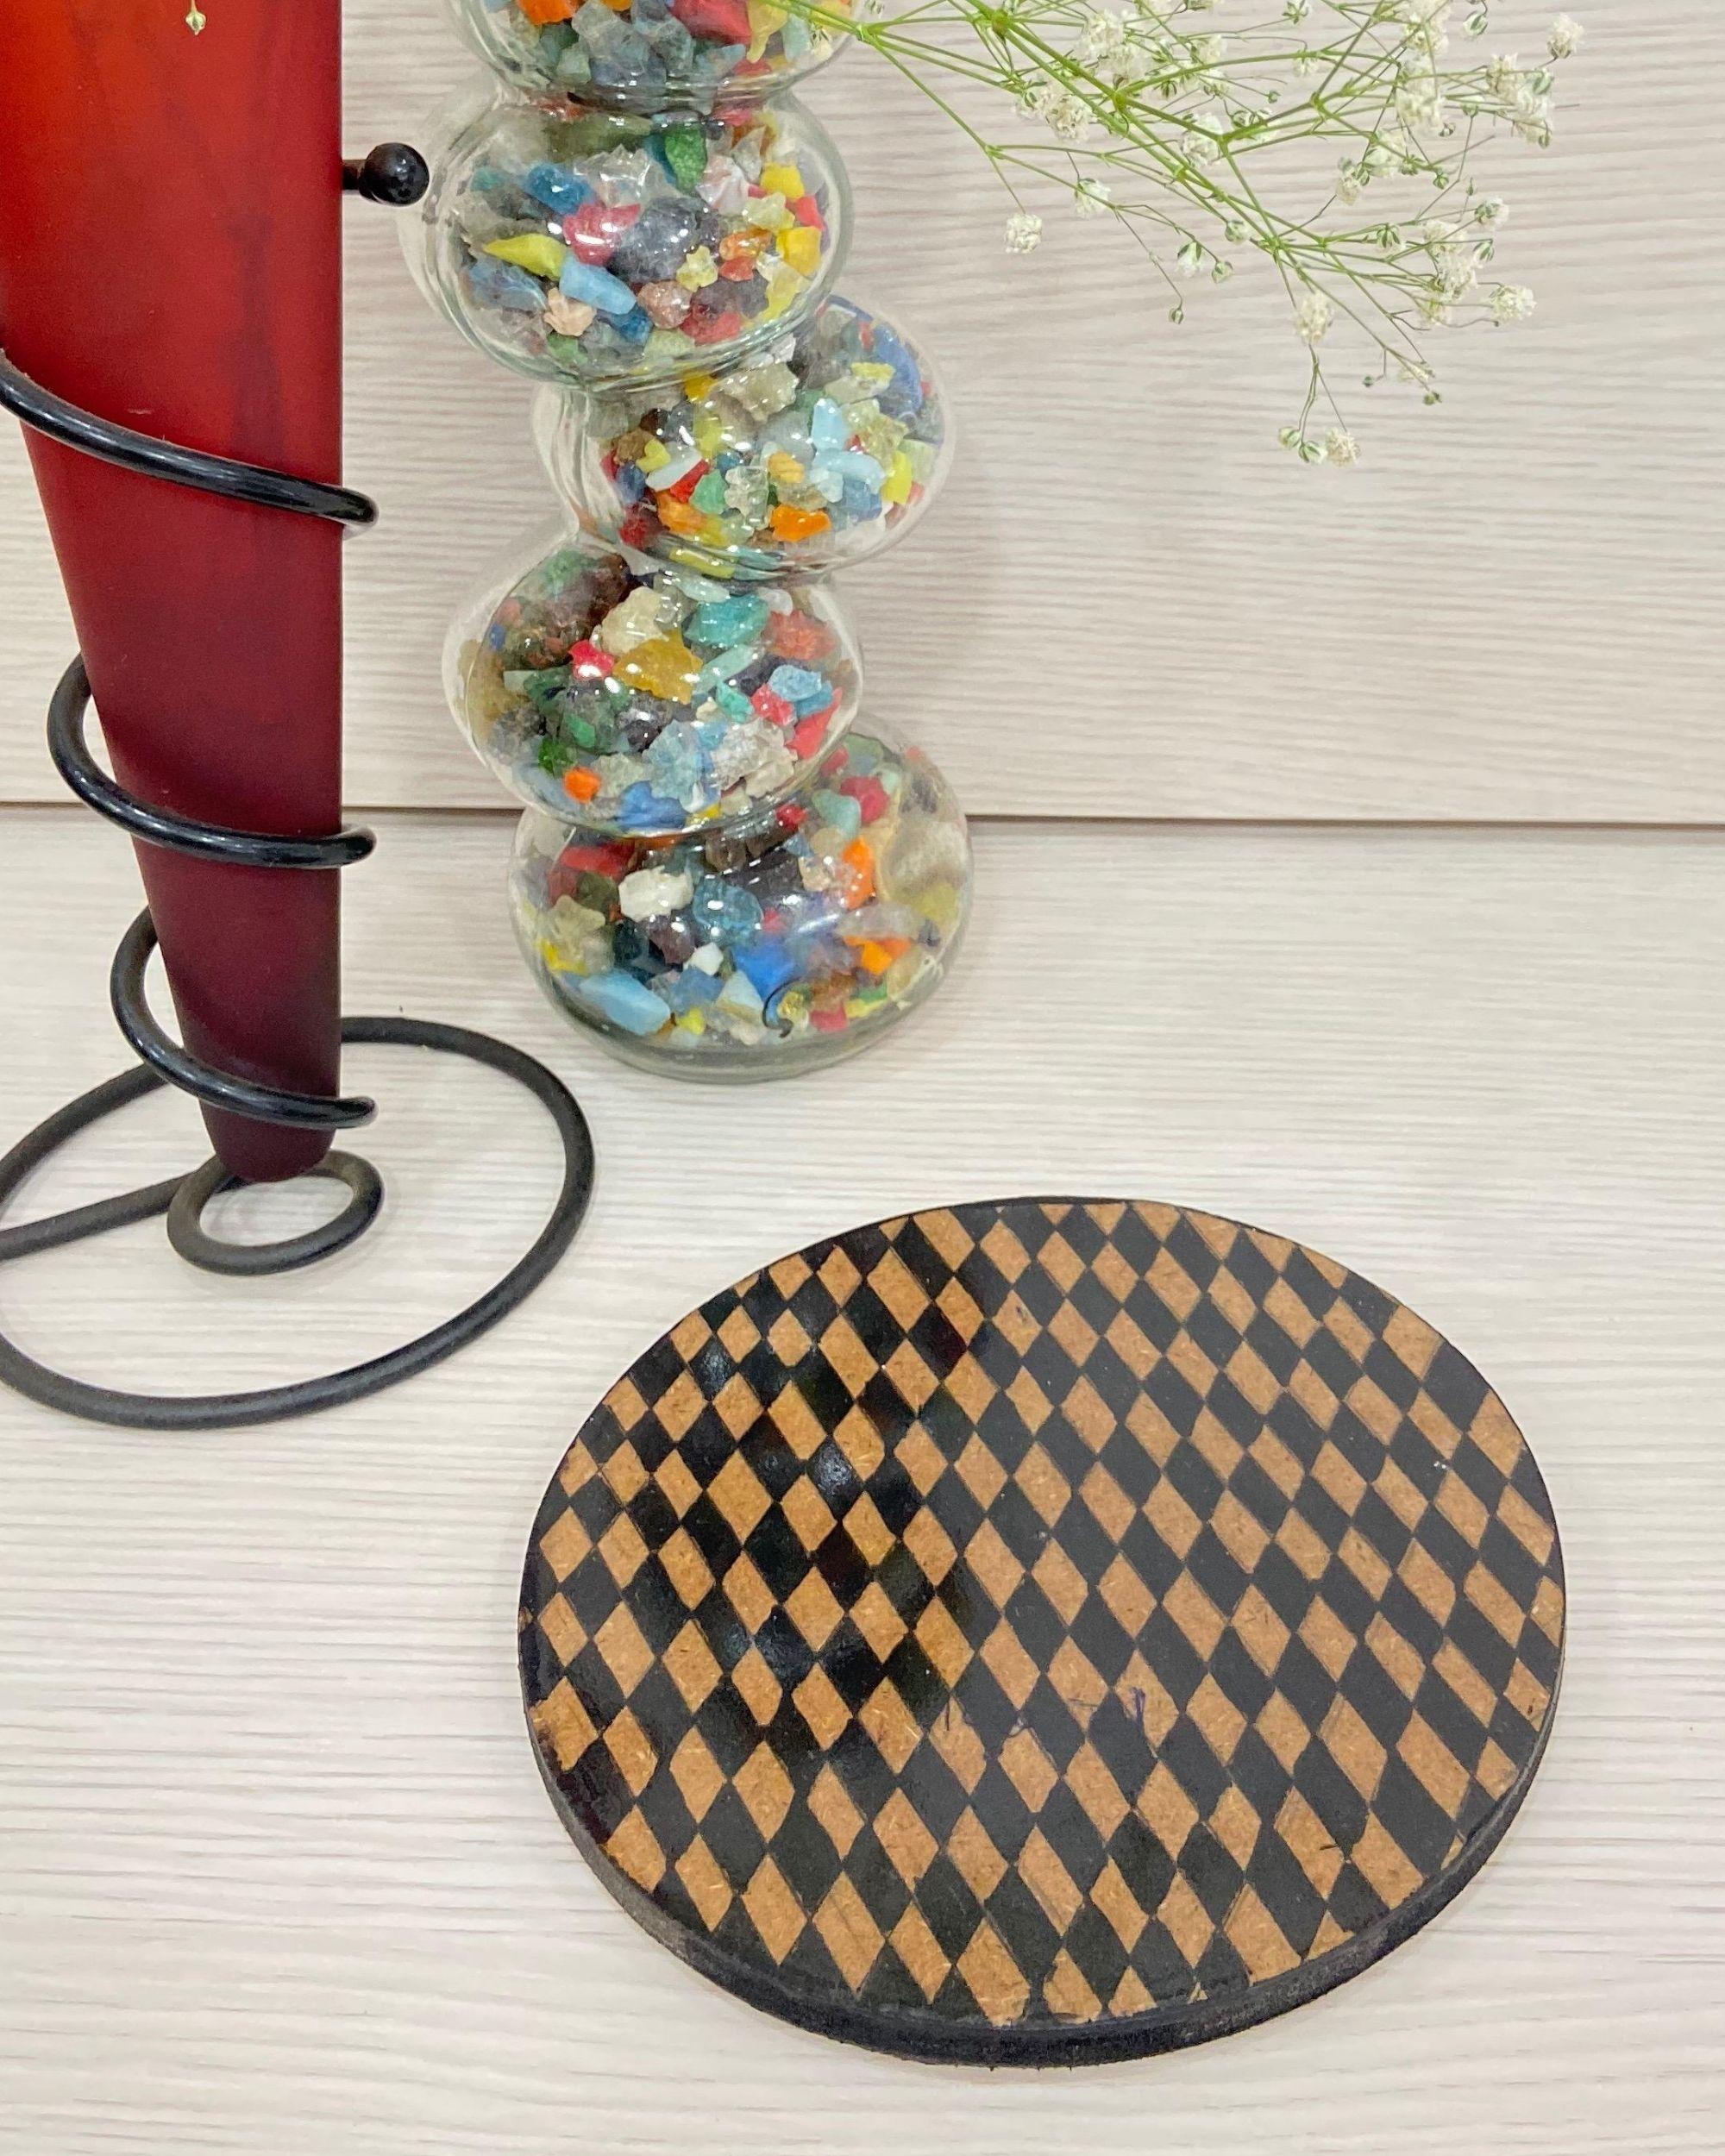 Black checkered hot plate